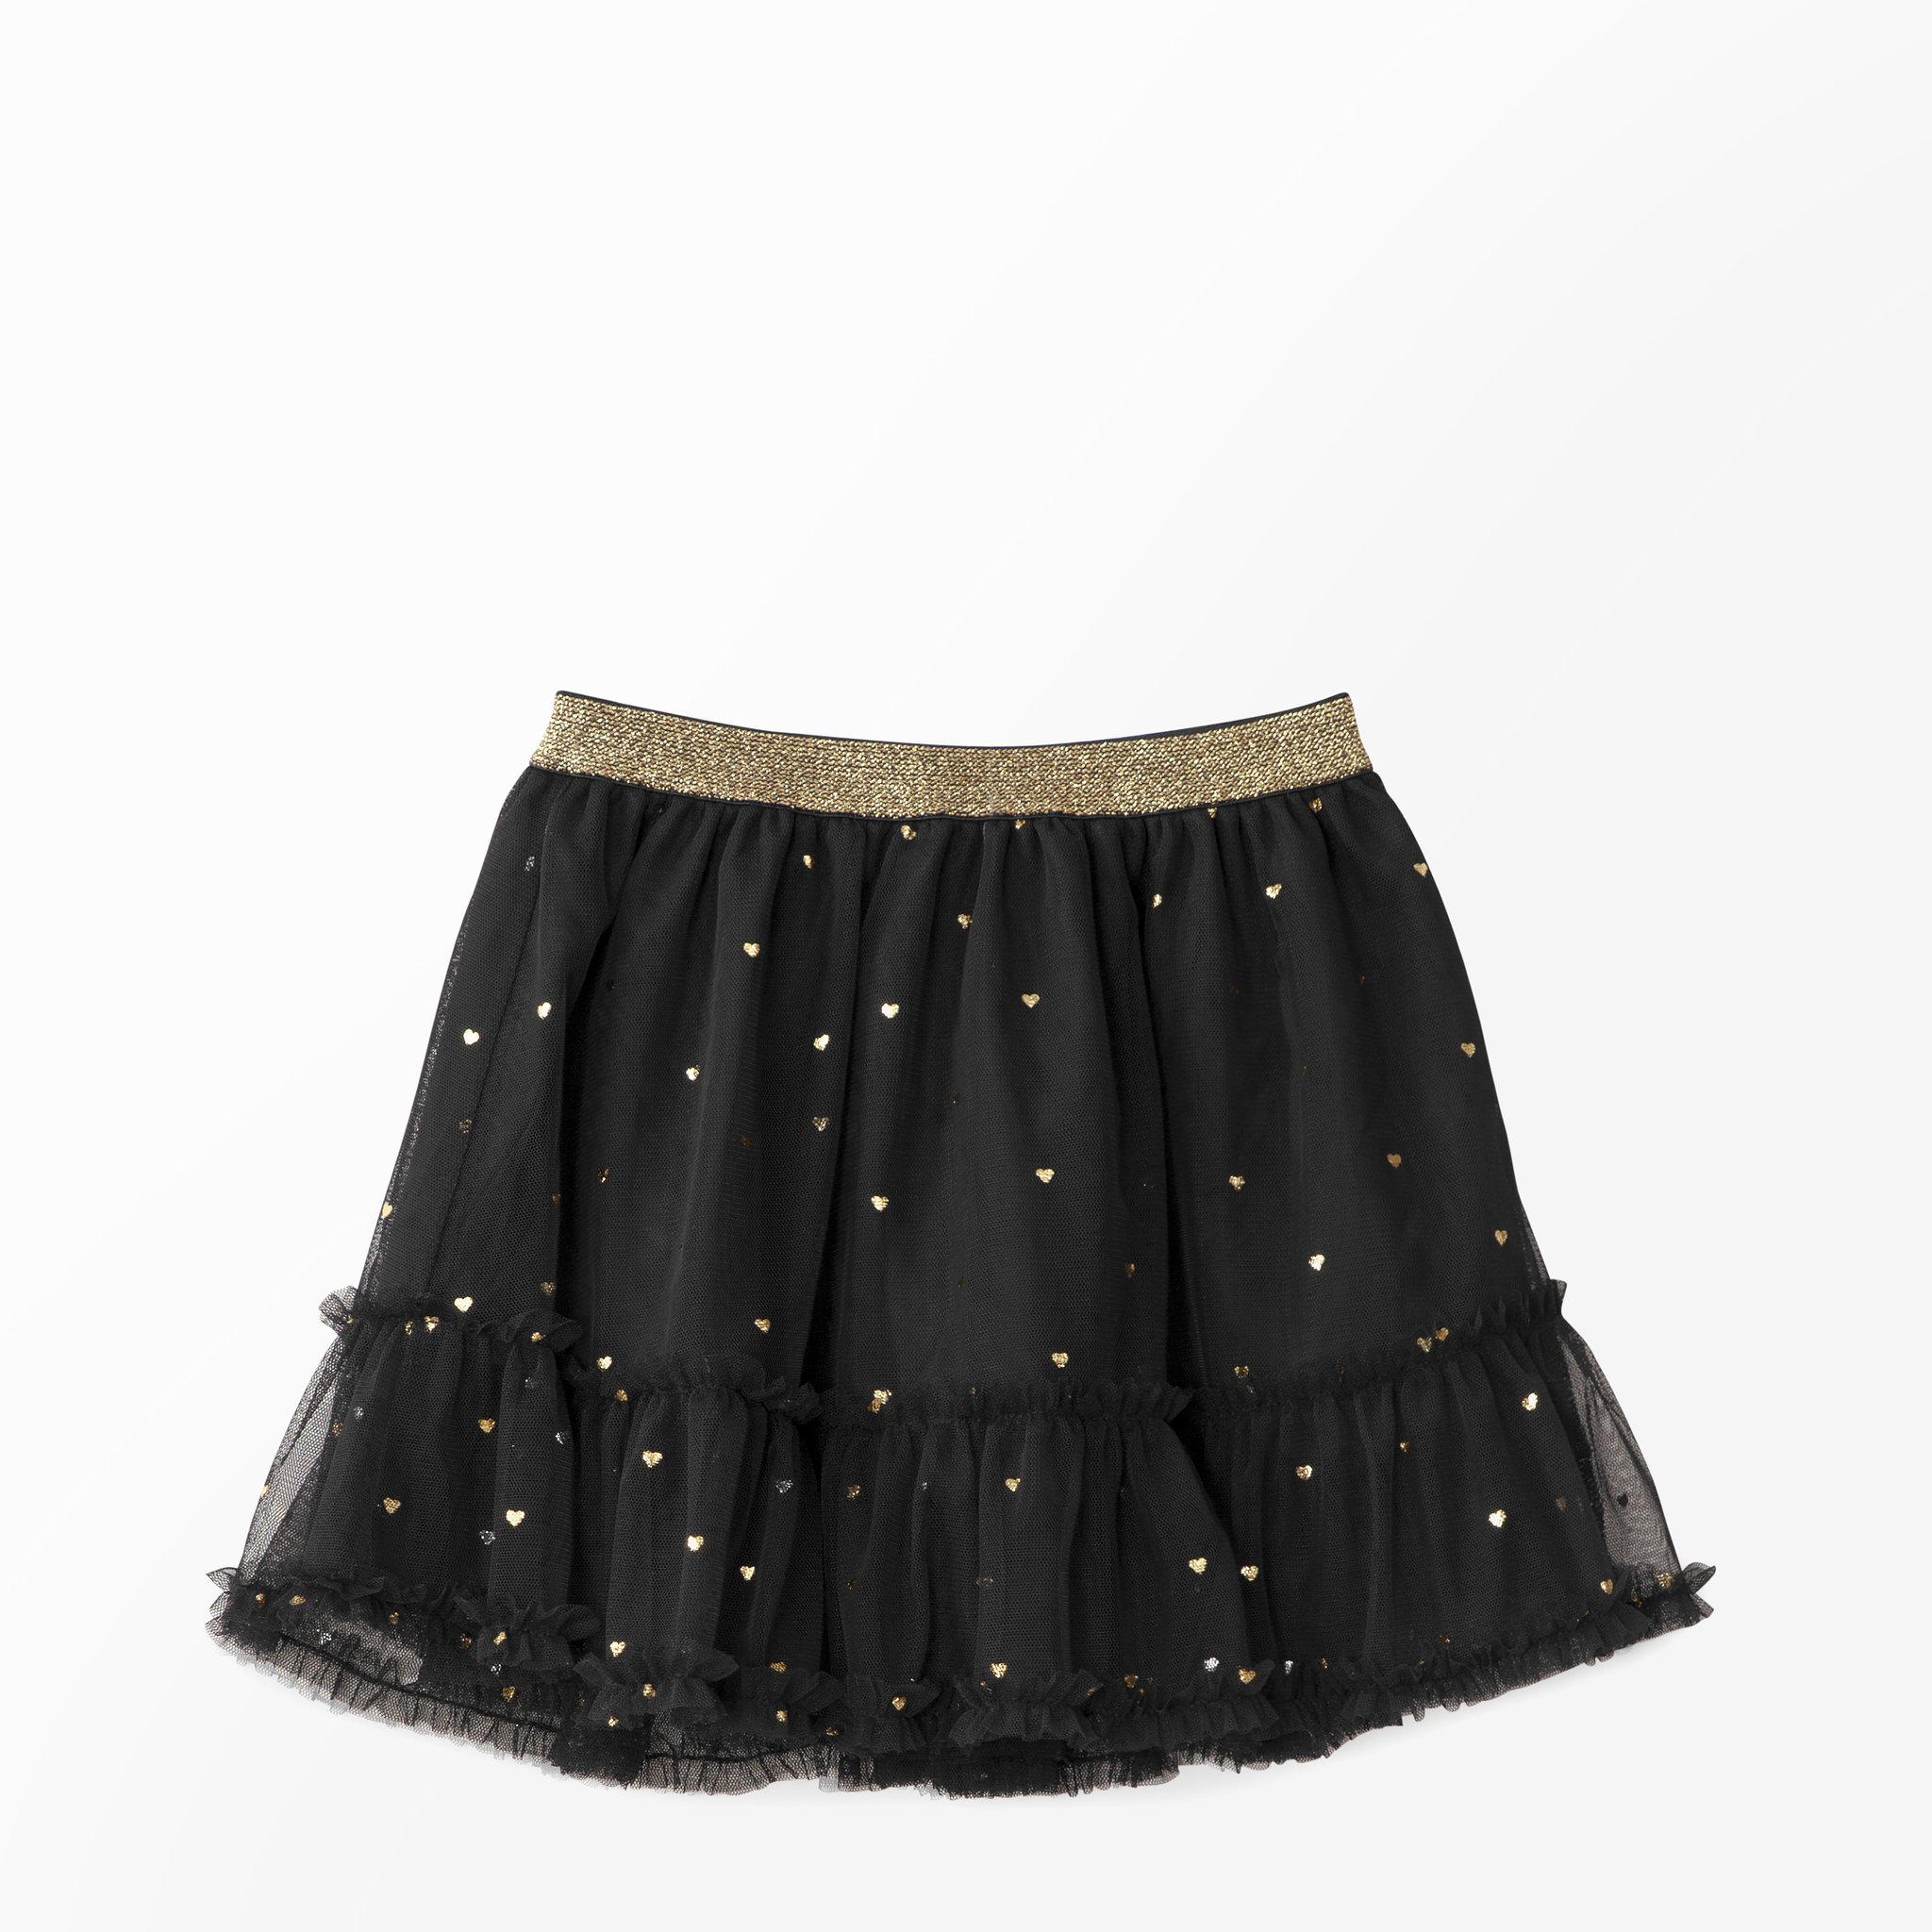 e9d6813e82f1 Kjol - Klänningar & kjolar - Köp online på åhlens.se!